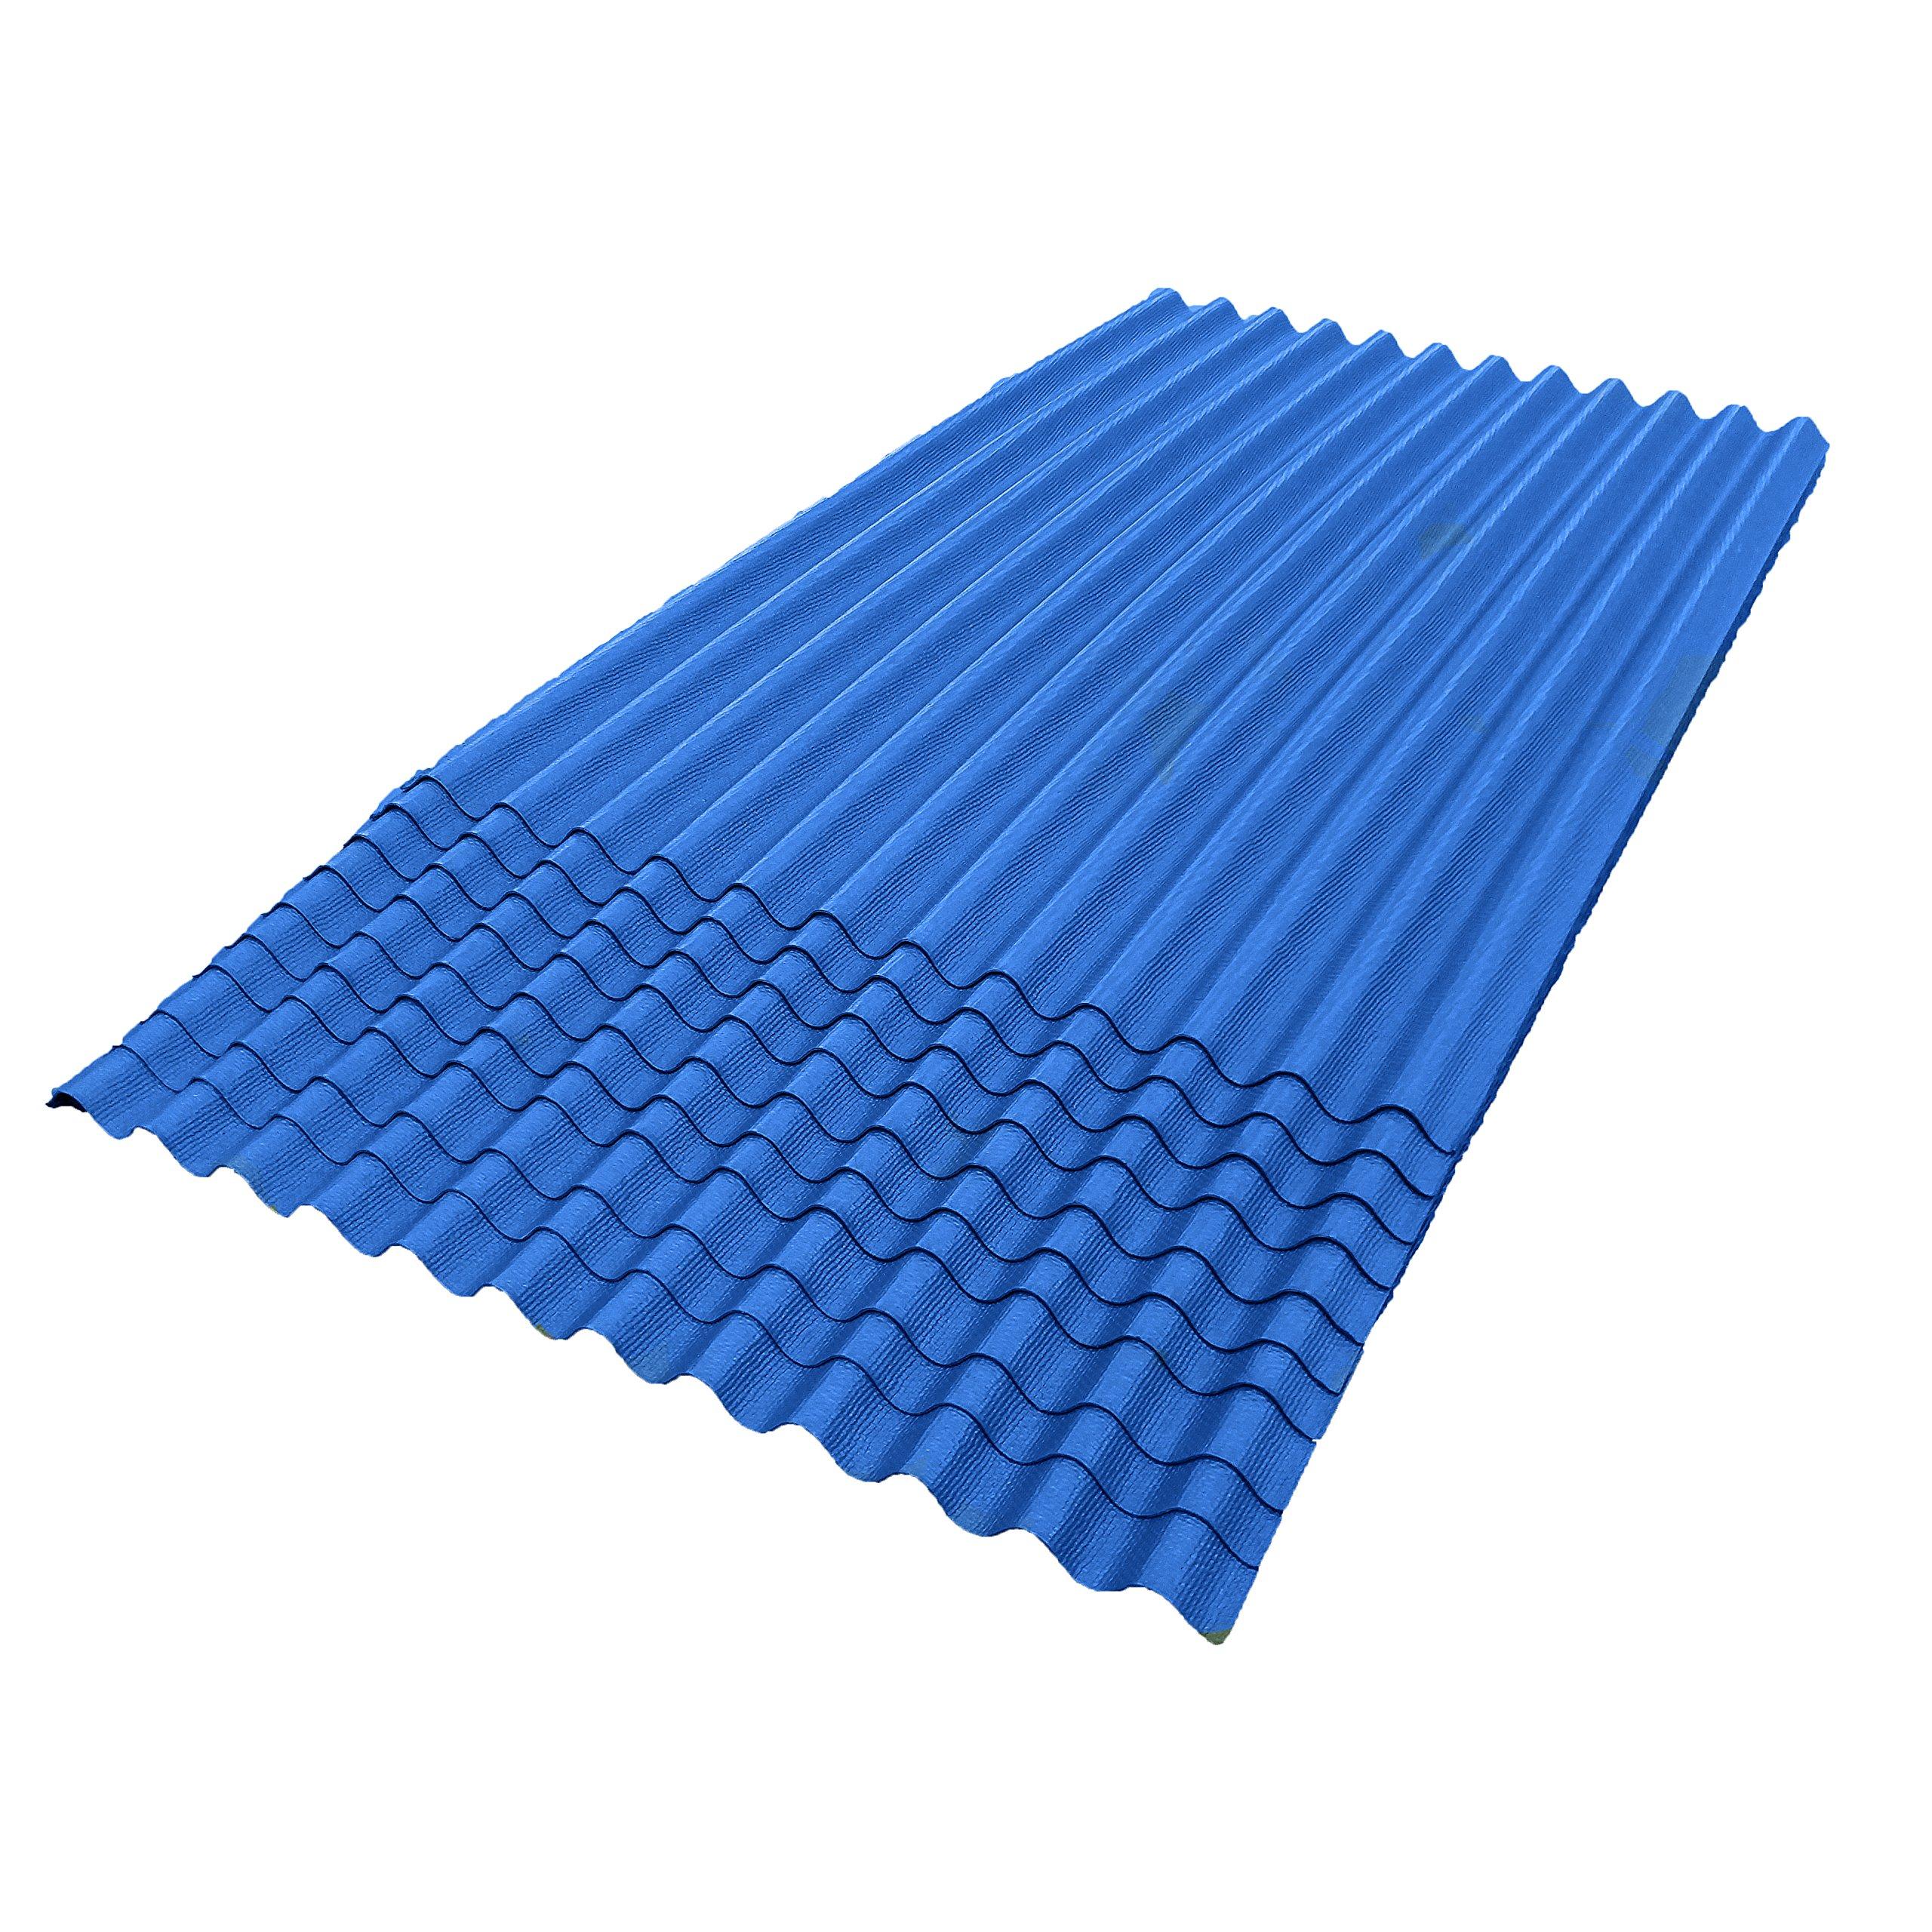 ONDURA 105 Corrugated Asphalt Roofing (10-Pack), Blue